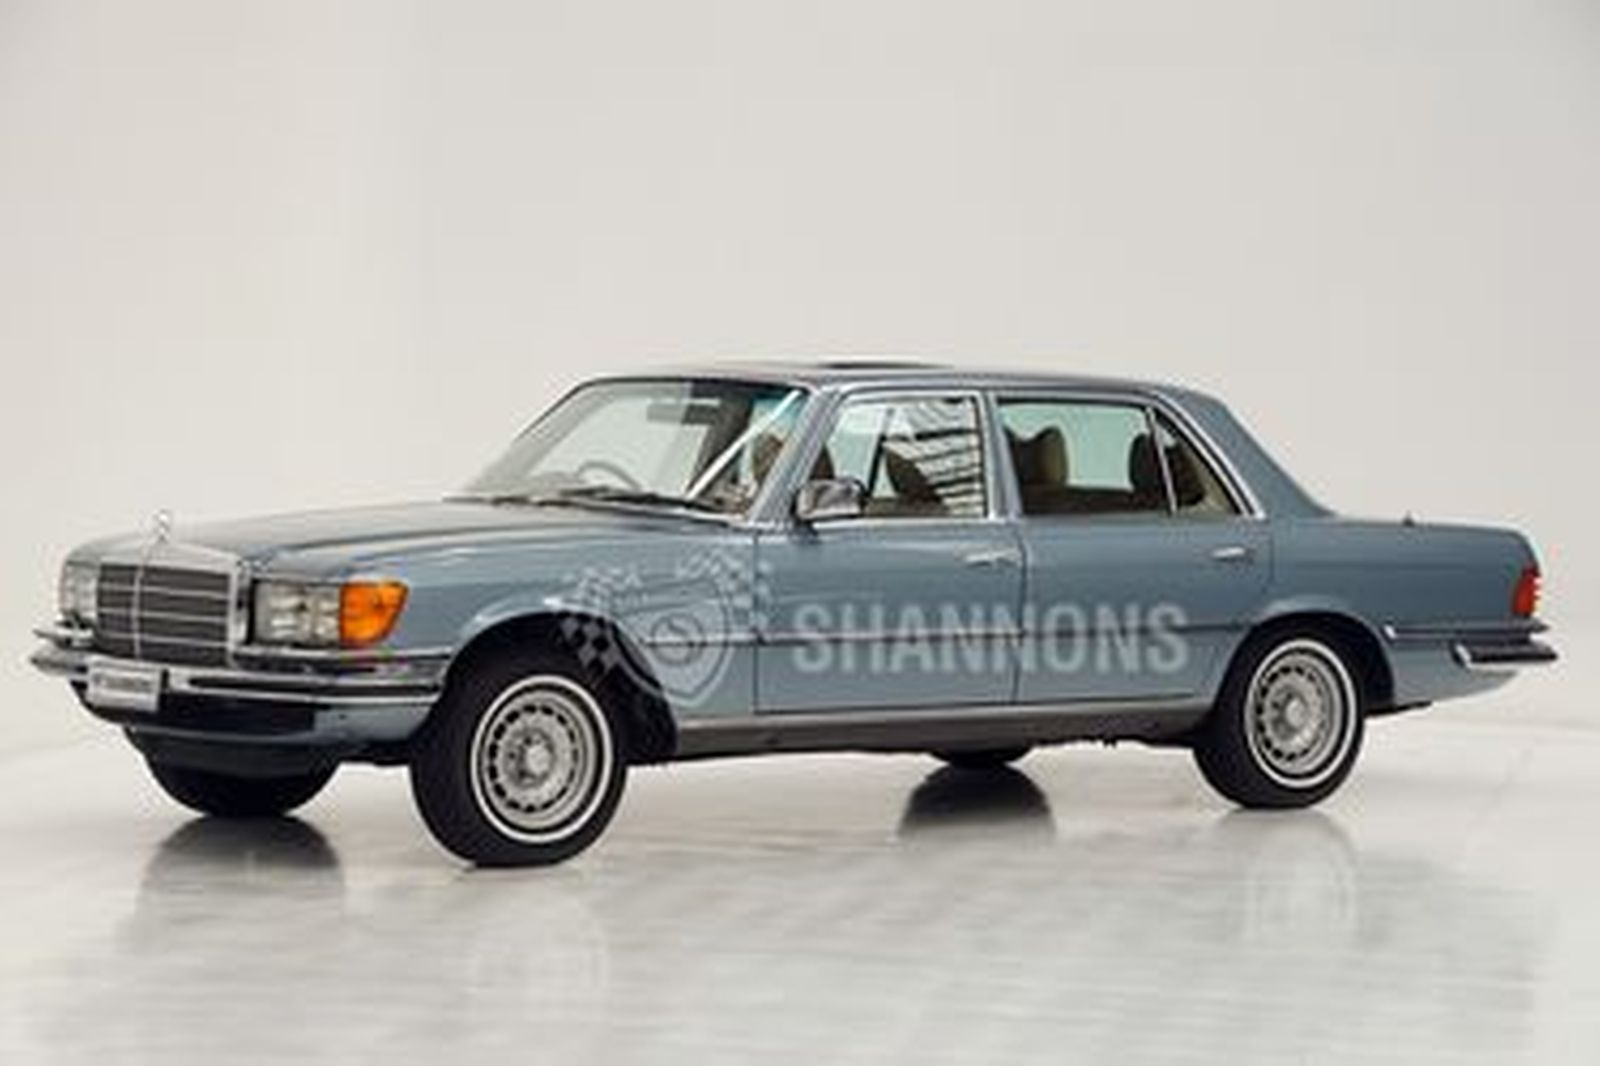 Mercedes-Benz 450 SEL 6.9 Saloon